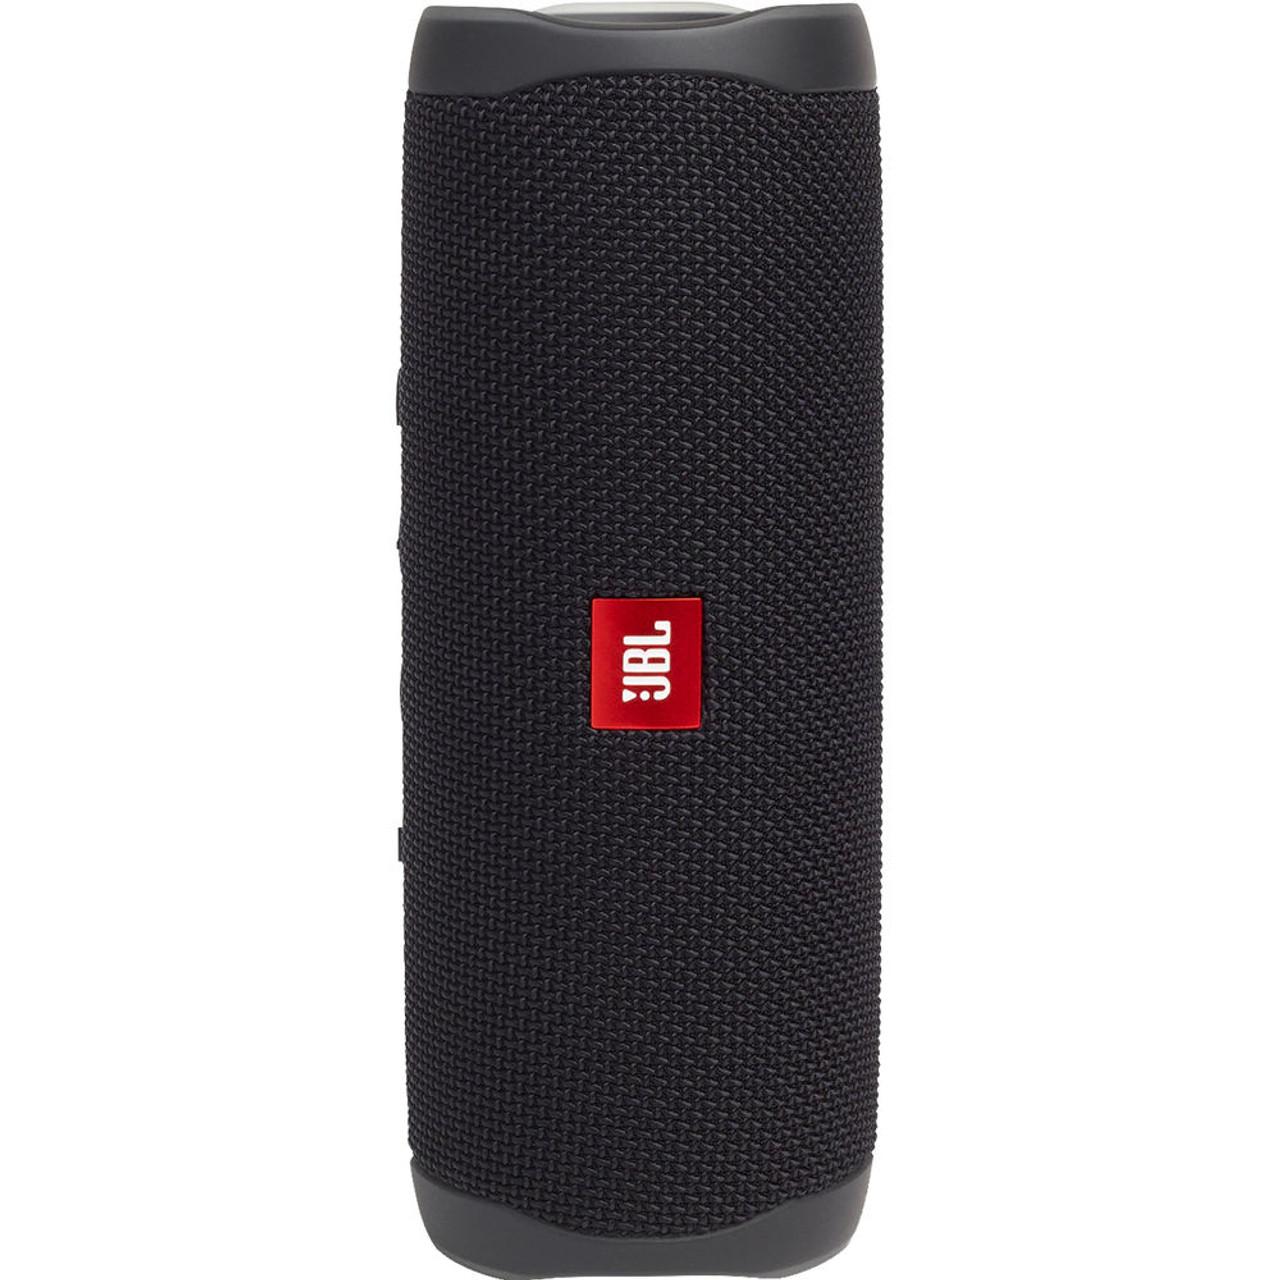 JBL JBLFLIP5BLKAM-Z FLIP 5 Portable Speaker Waterproof, Black -Certified Refurbished